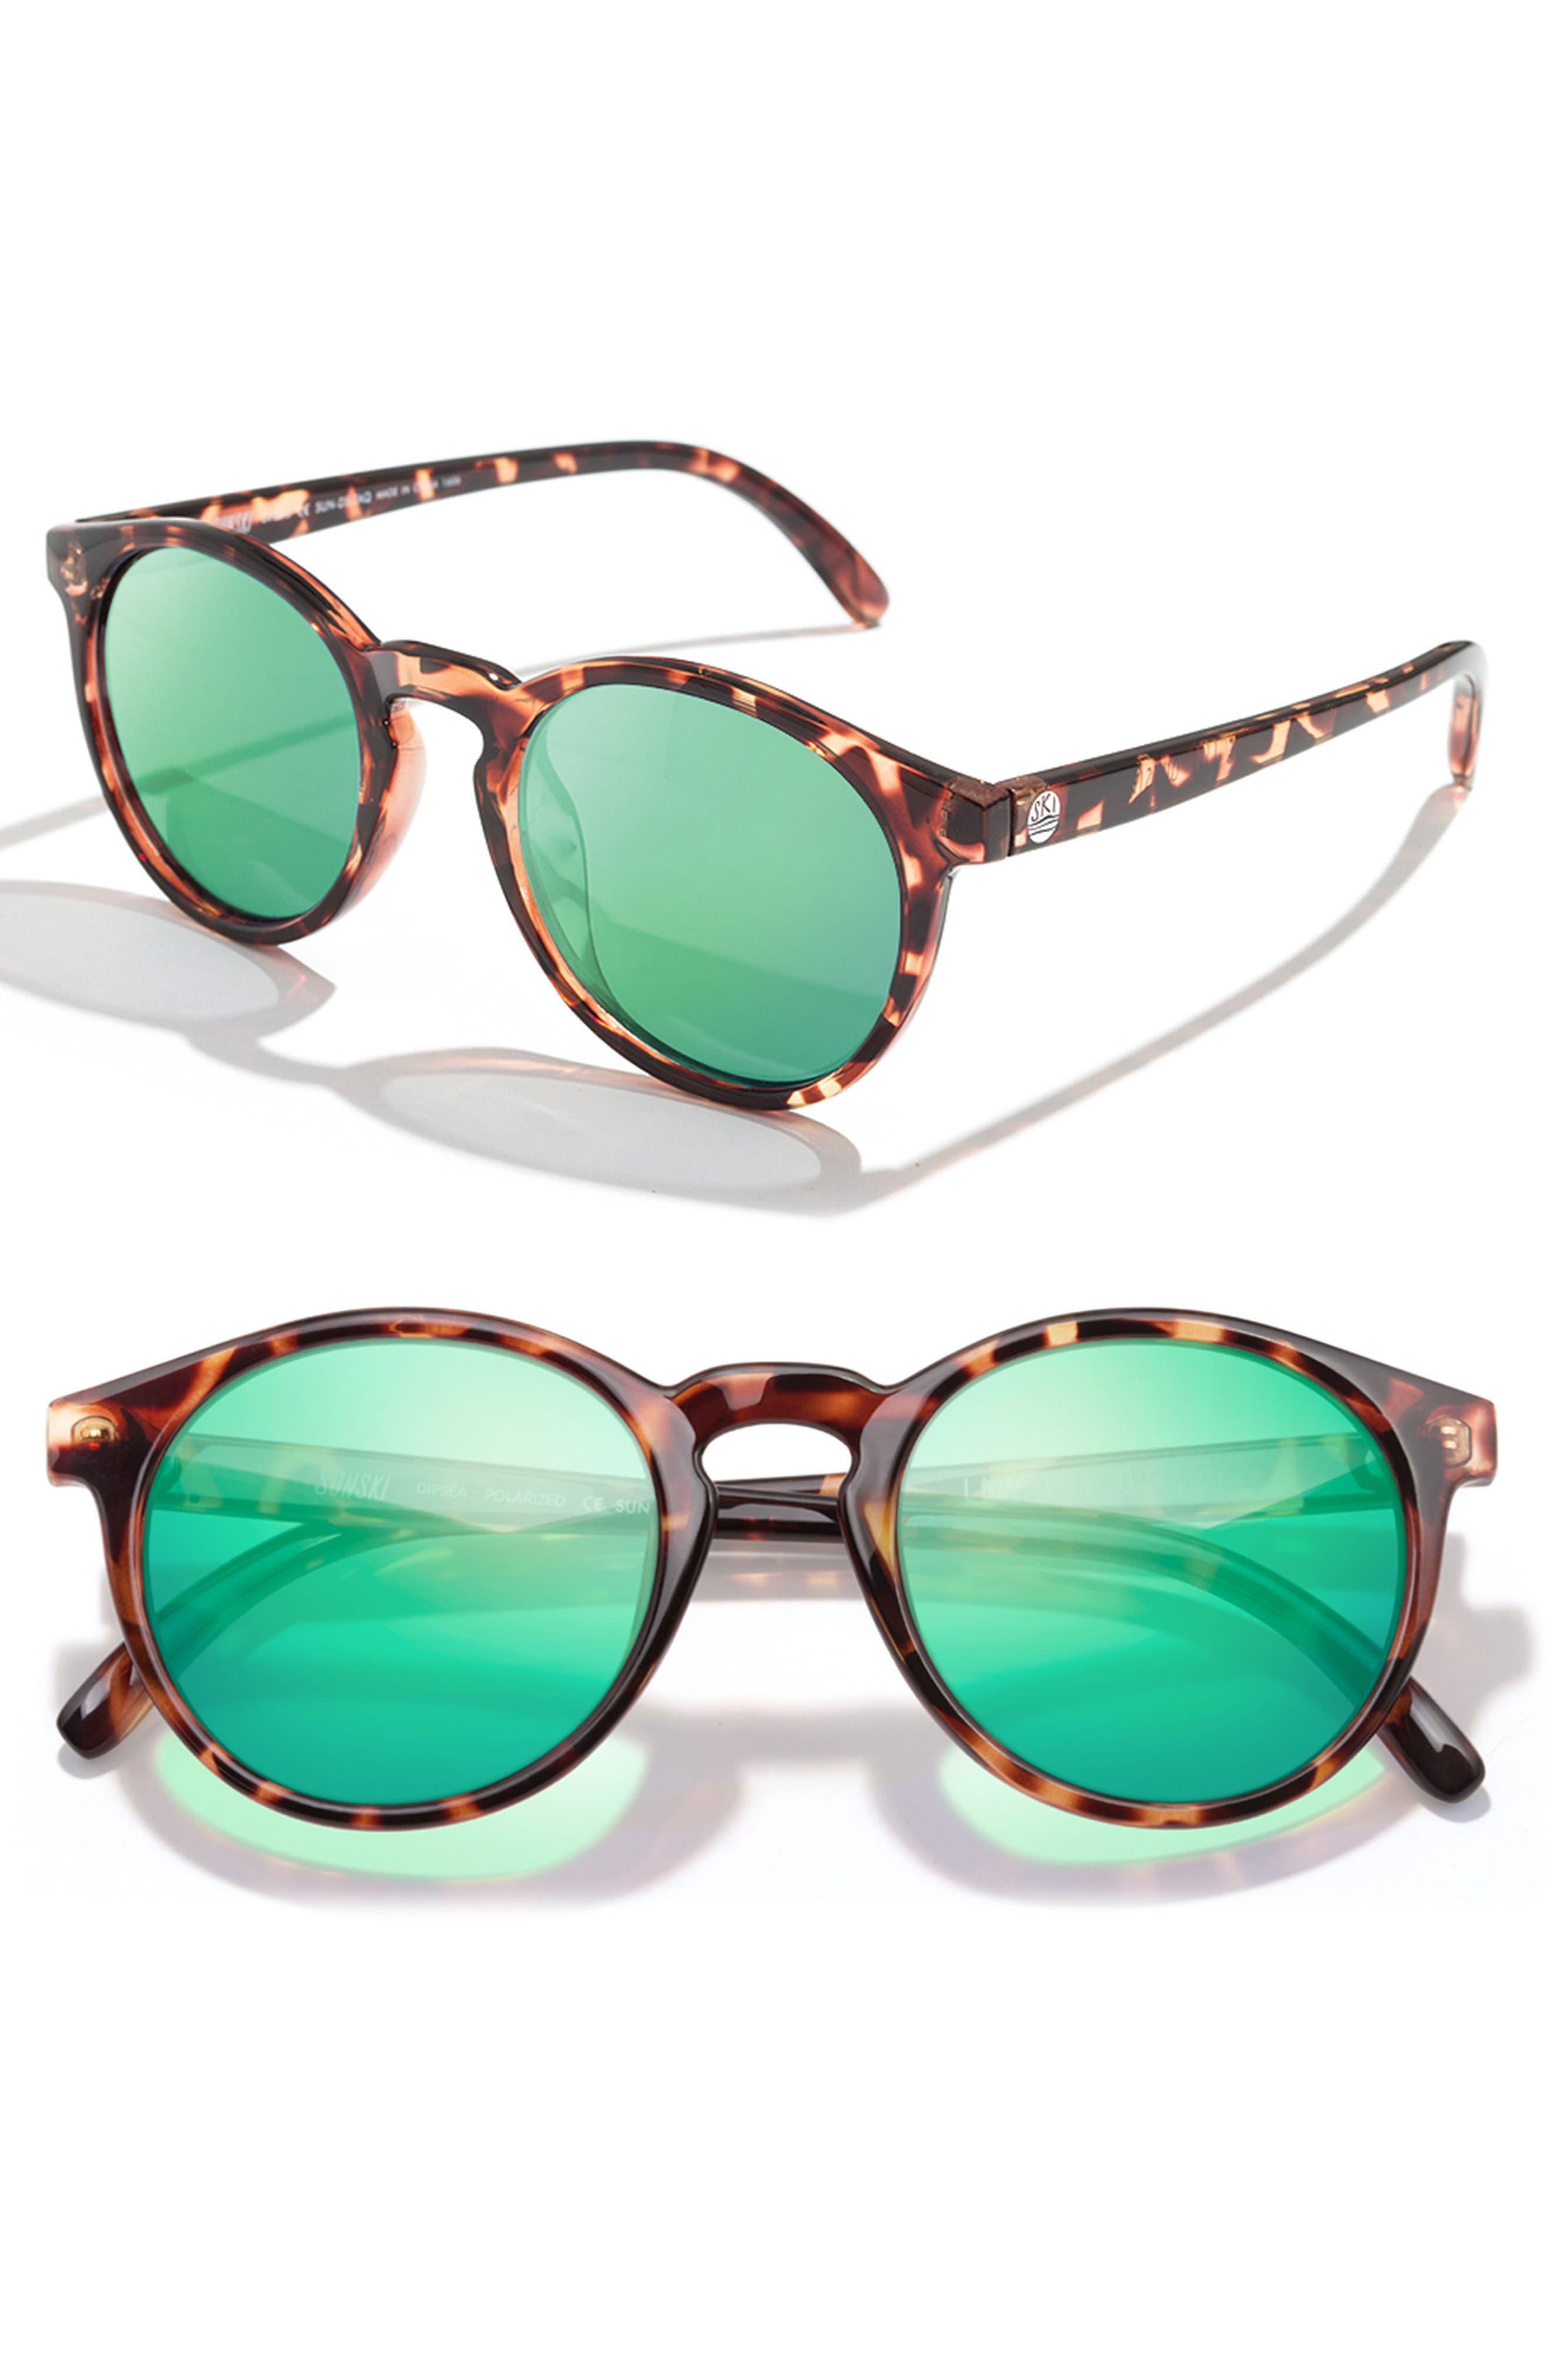 Dipsea 48mm Polarized Sunglasses,                             Main thumbnail 1, color,                             TORTOISE EMERALD